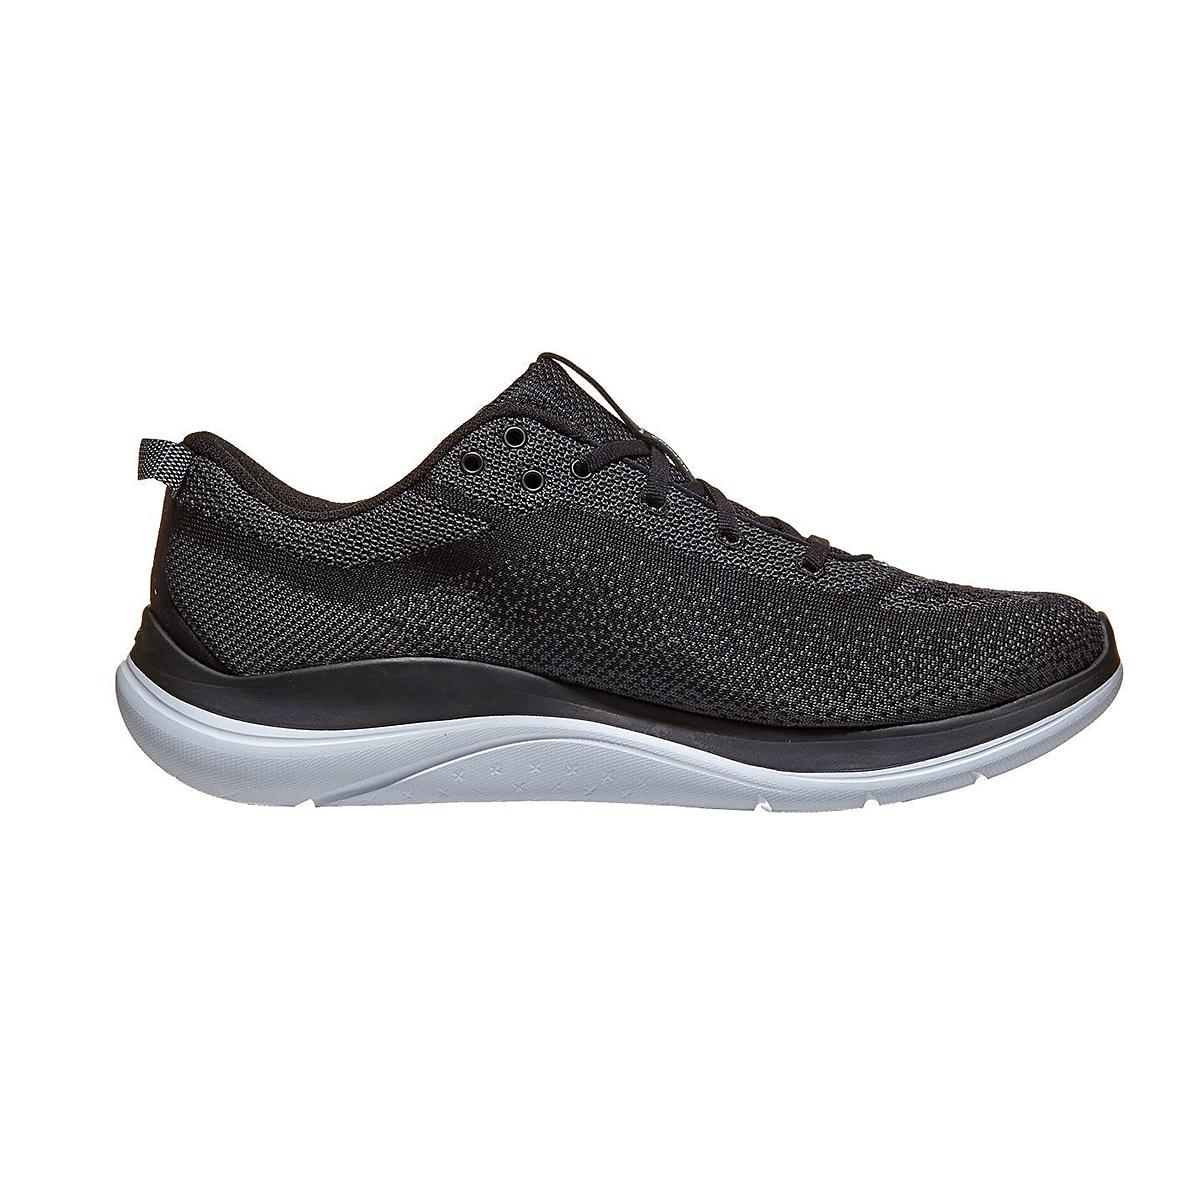 Men's Hoka One One Hupana Flow Running Shoe - Color: Black/ Dark Shadow - Size: 7 - Width: Wide, Black/ Dark Shadow, large, image 2